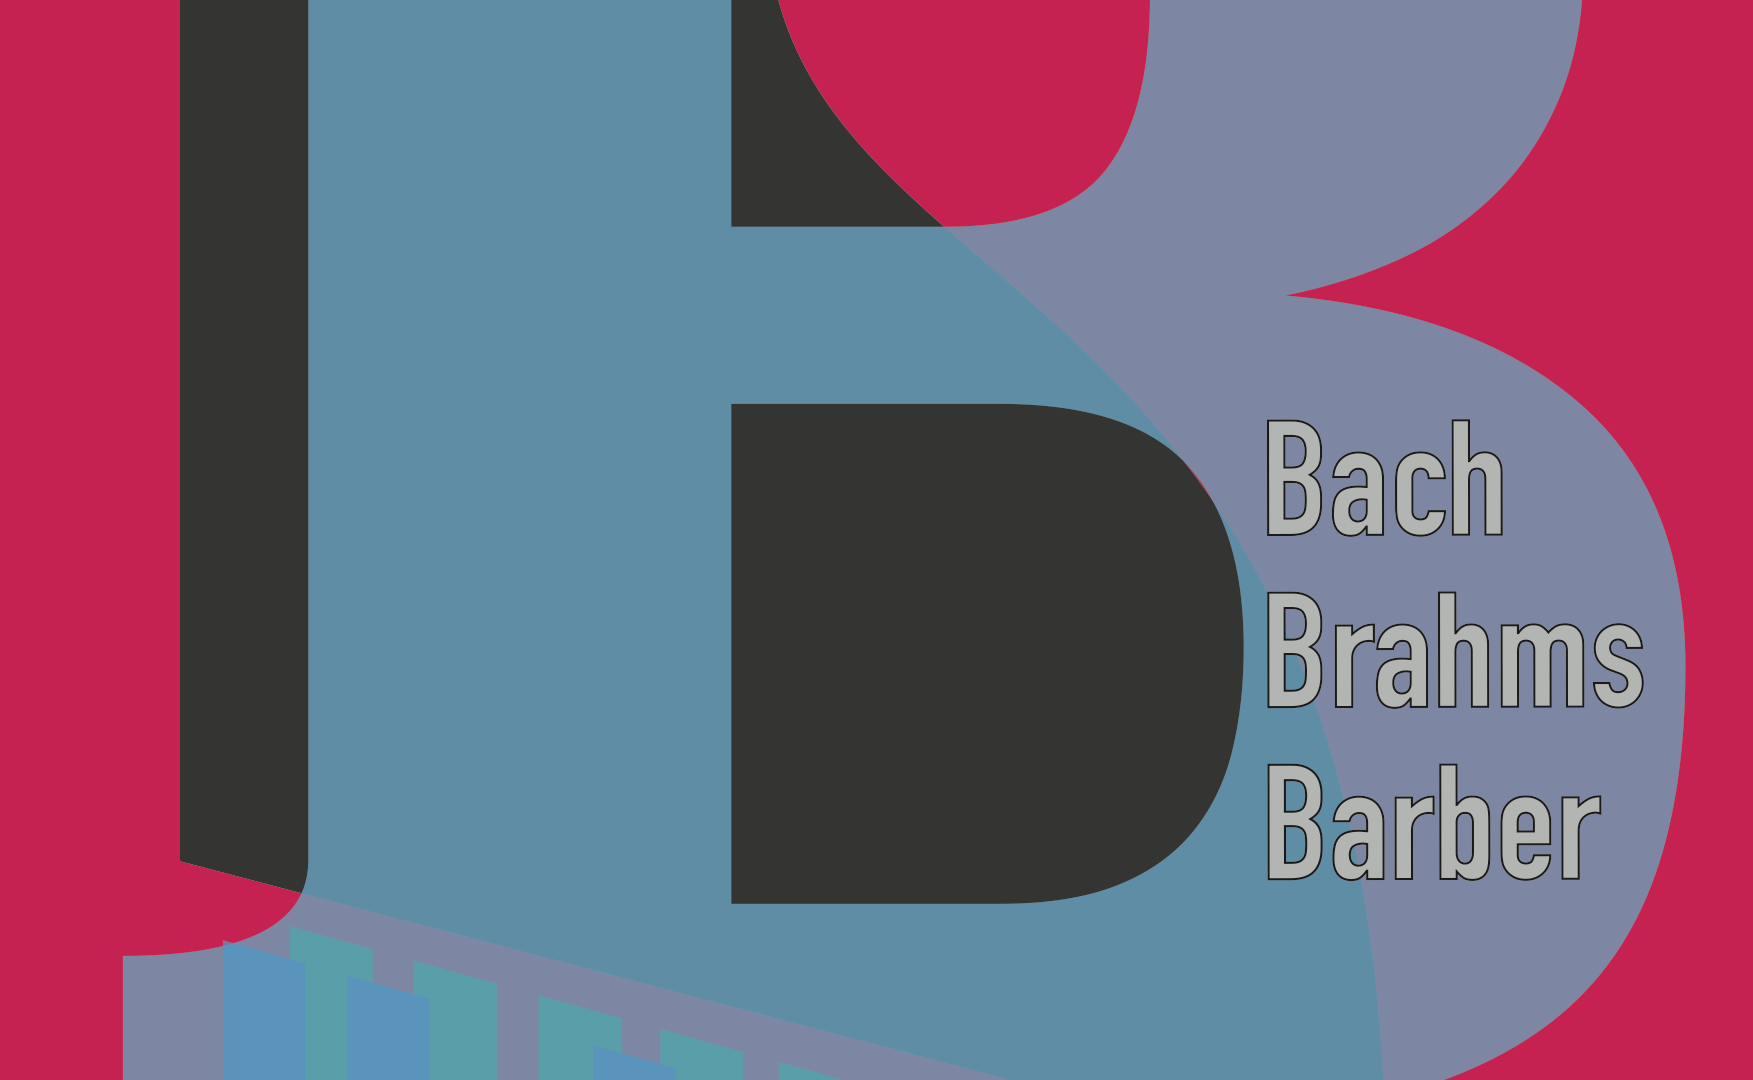 Drei grosse B: Bach Brahms Barber